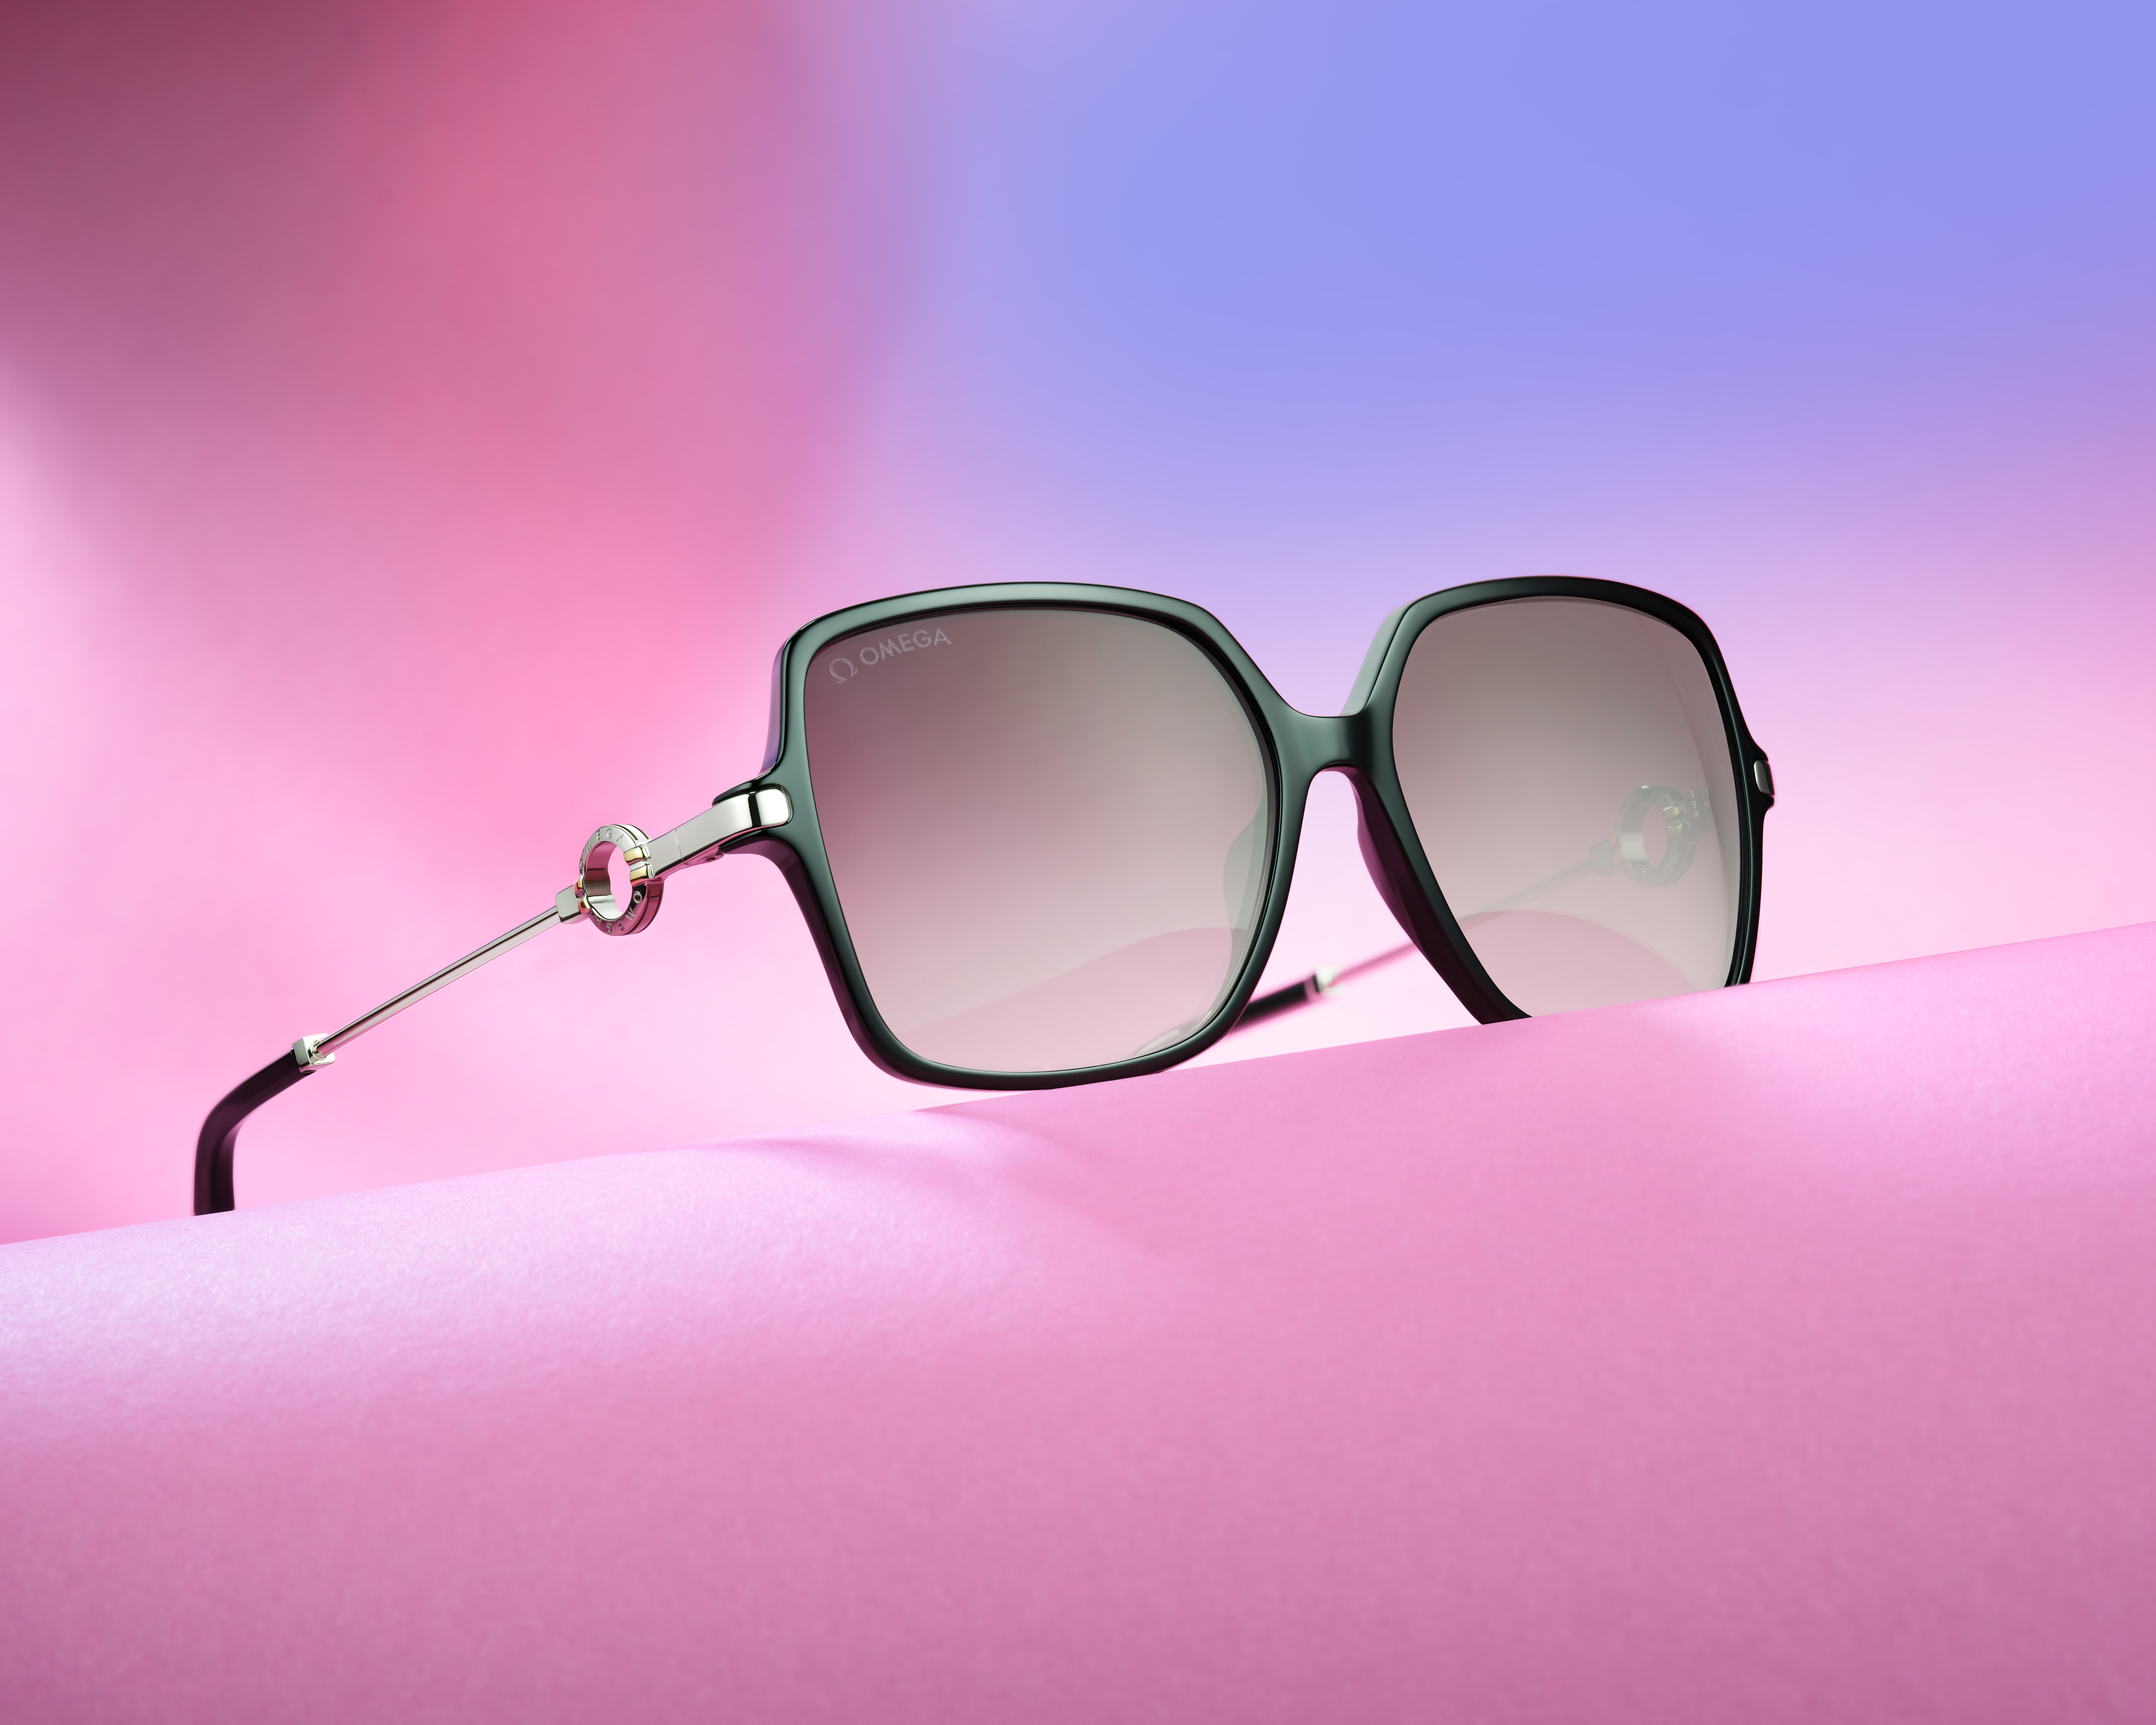 OMEGA Sunglasses 2021 Collection